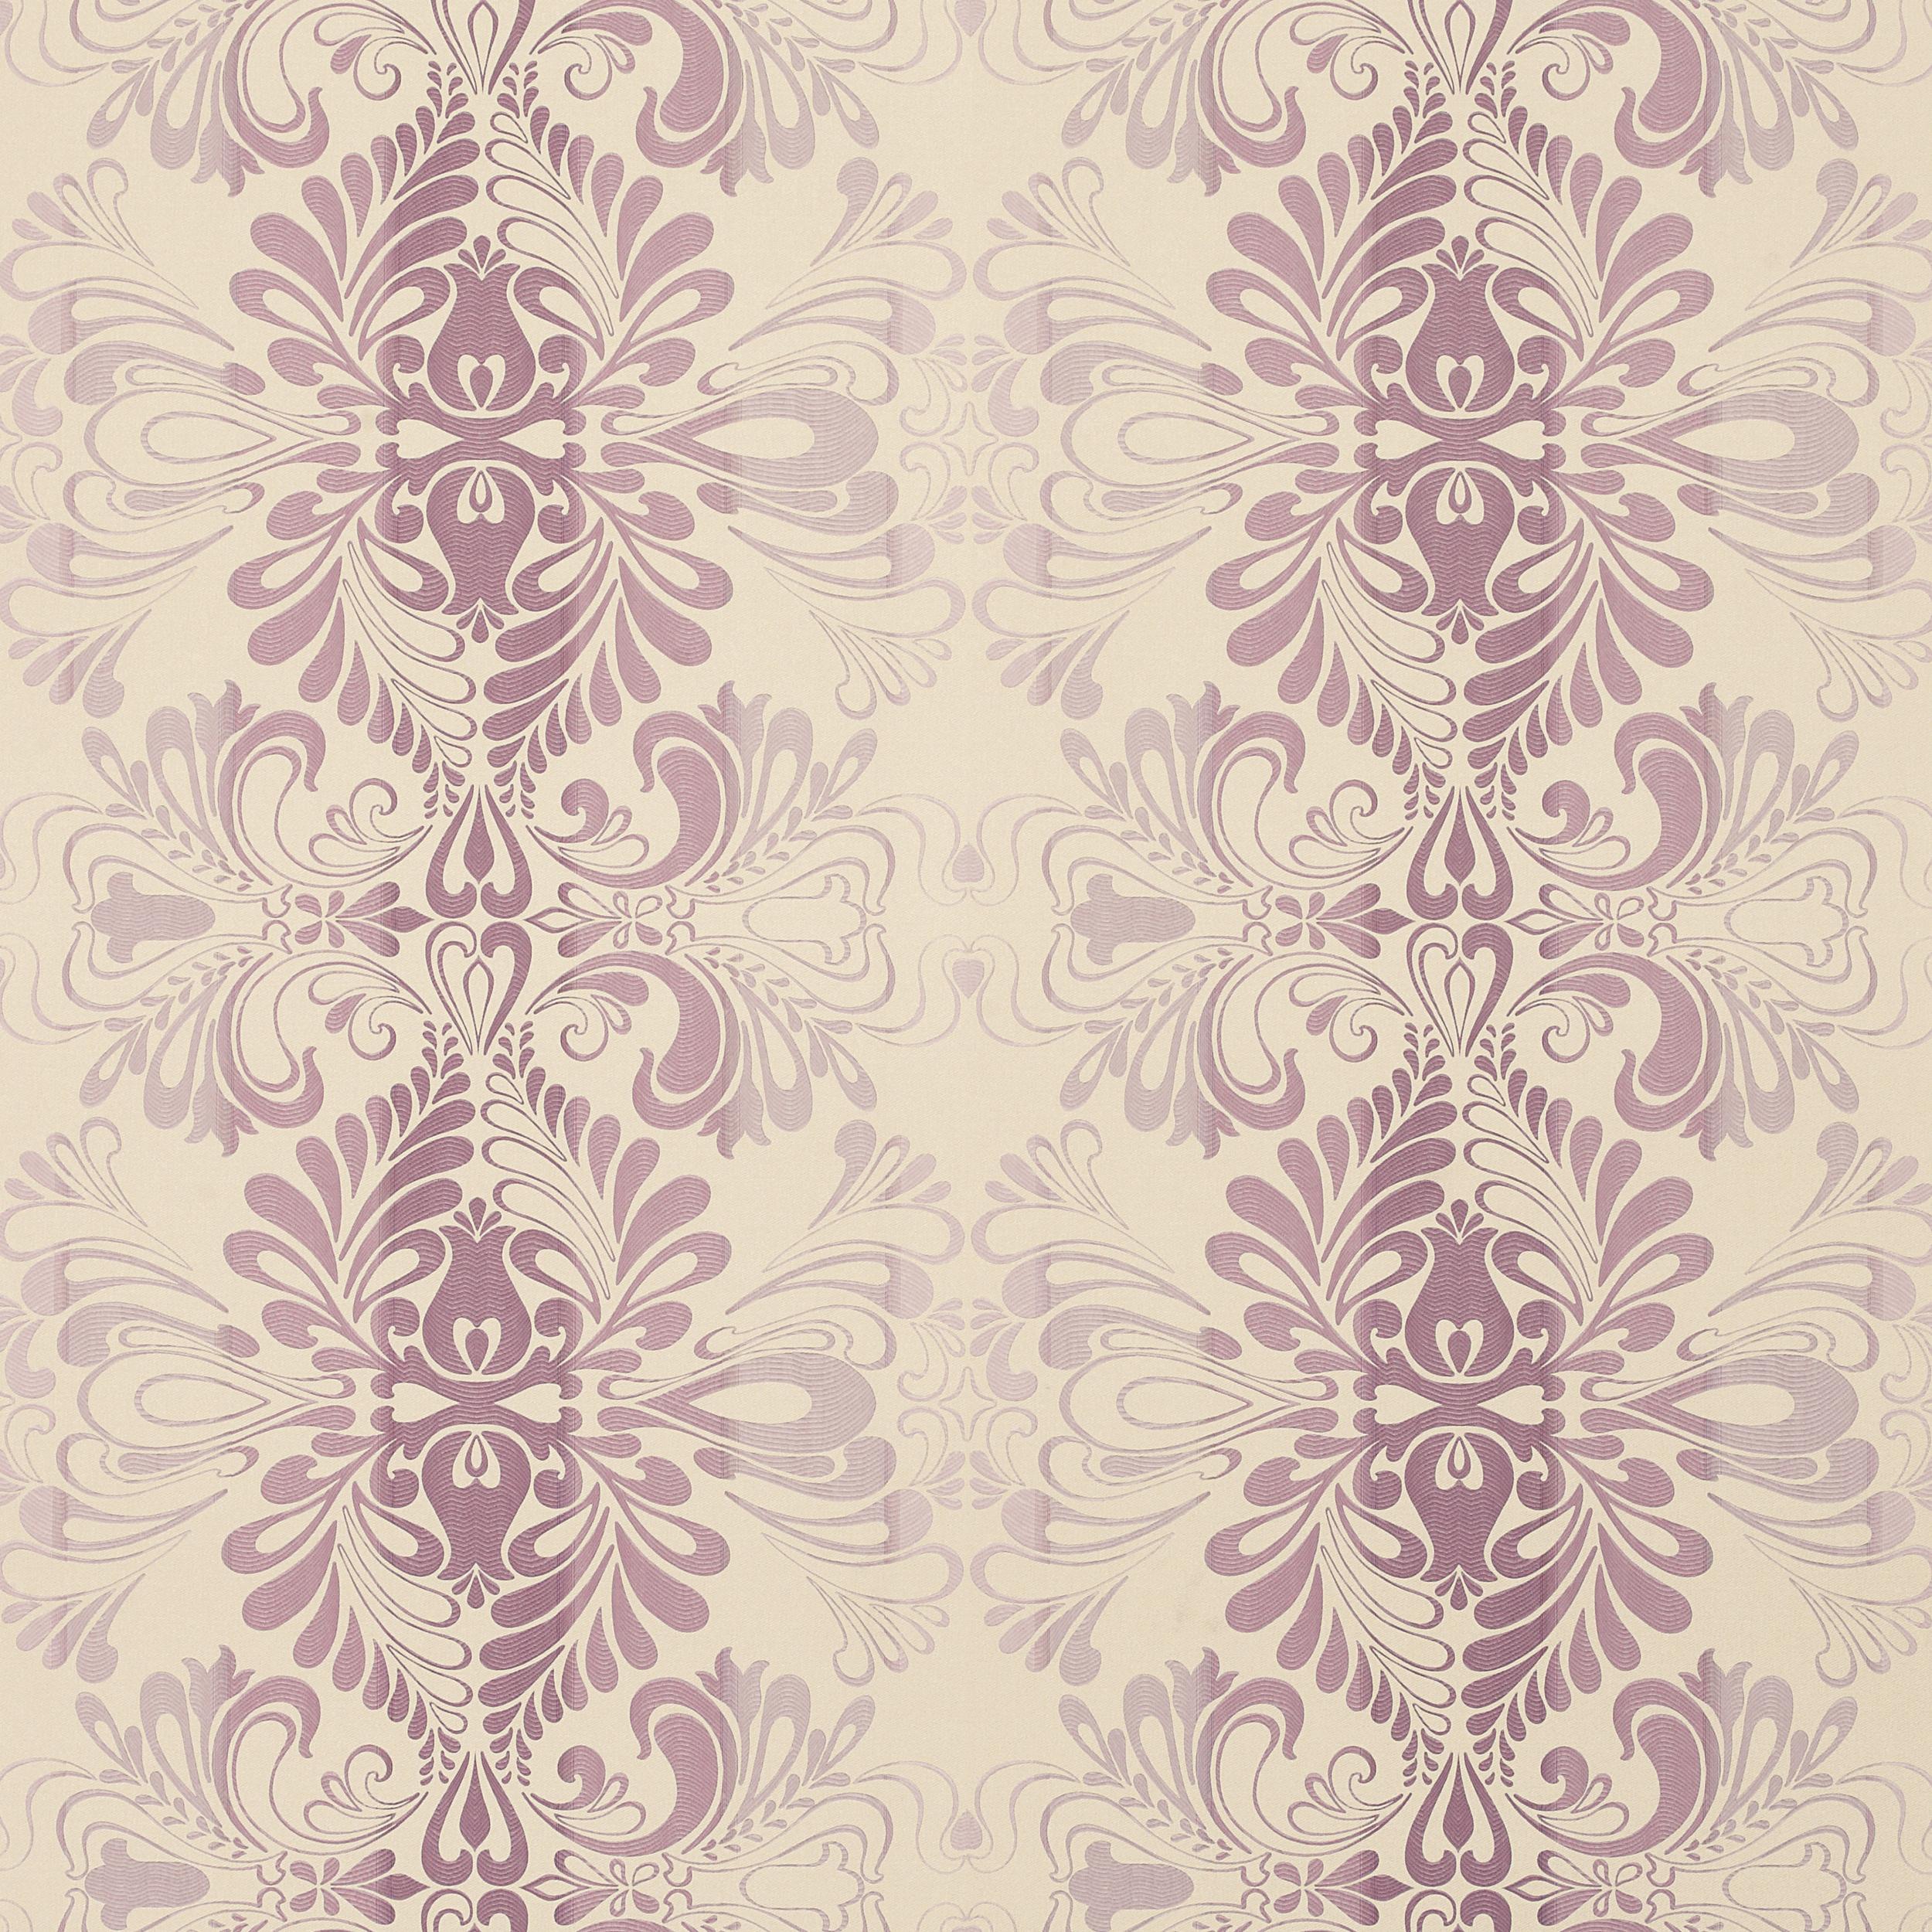 Fitzroy Amethyst Damask Wallpaper 2500x2500